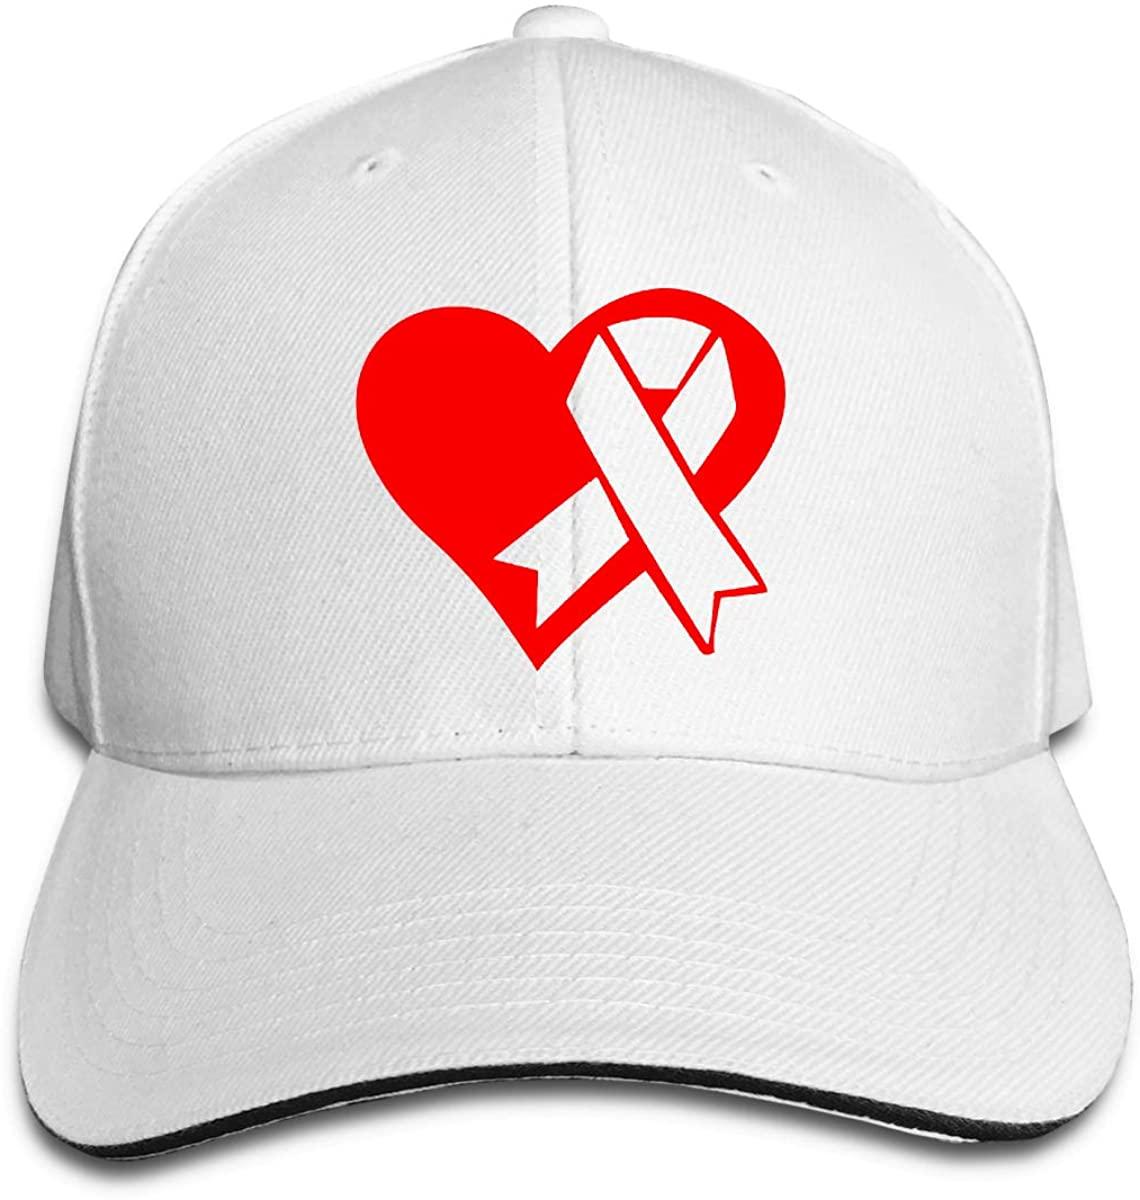 Asthma Diabetes Brain Cancer Parkinson's Disease Men's Or Women's Outdoor Baseball Cap Adjustable Strap